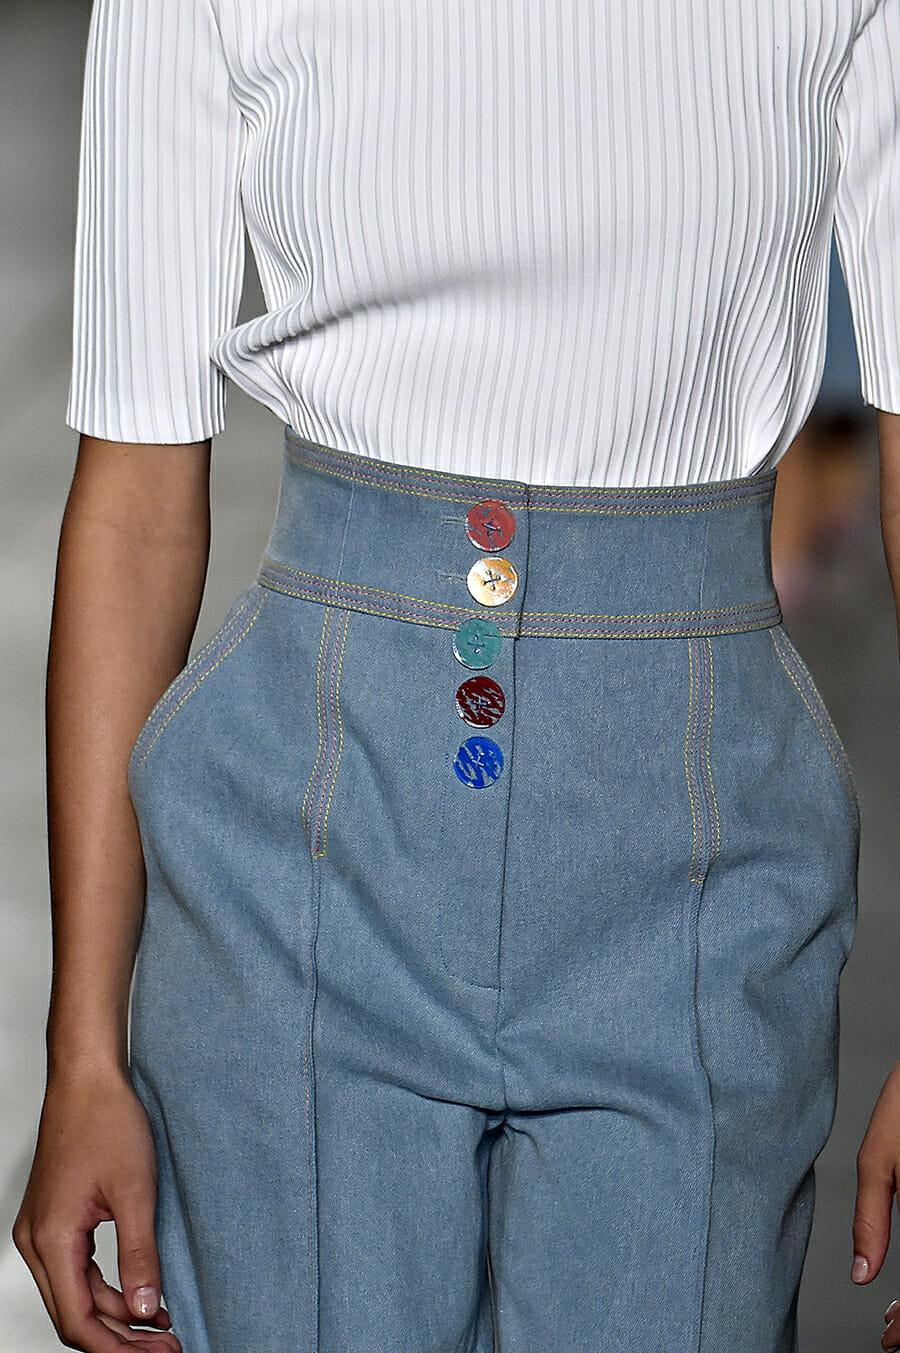 Carolina-Herrera-New-York-Fashion-Week-Spring-Summer-2018-NY-September-2017-look9-detail2